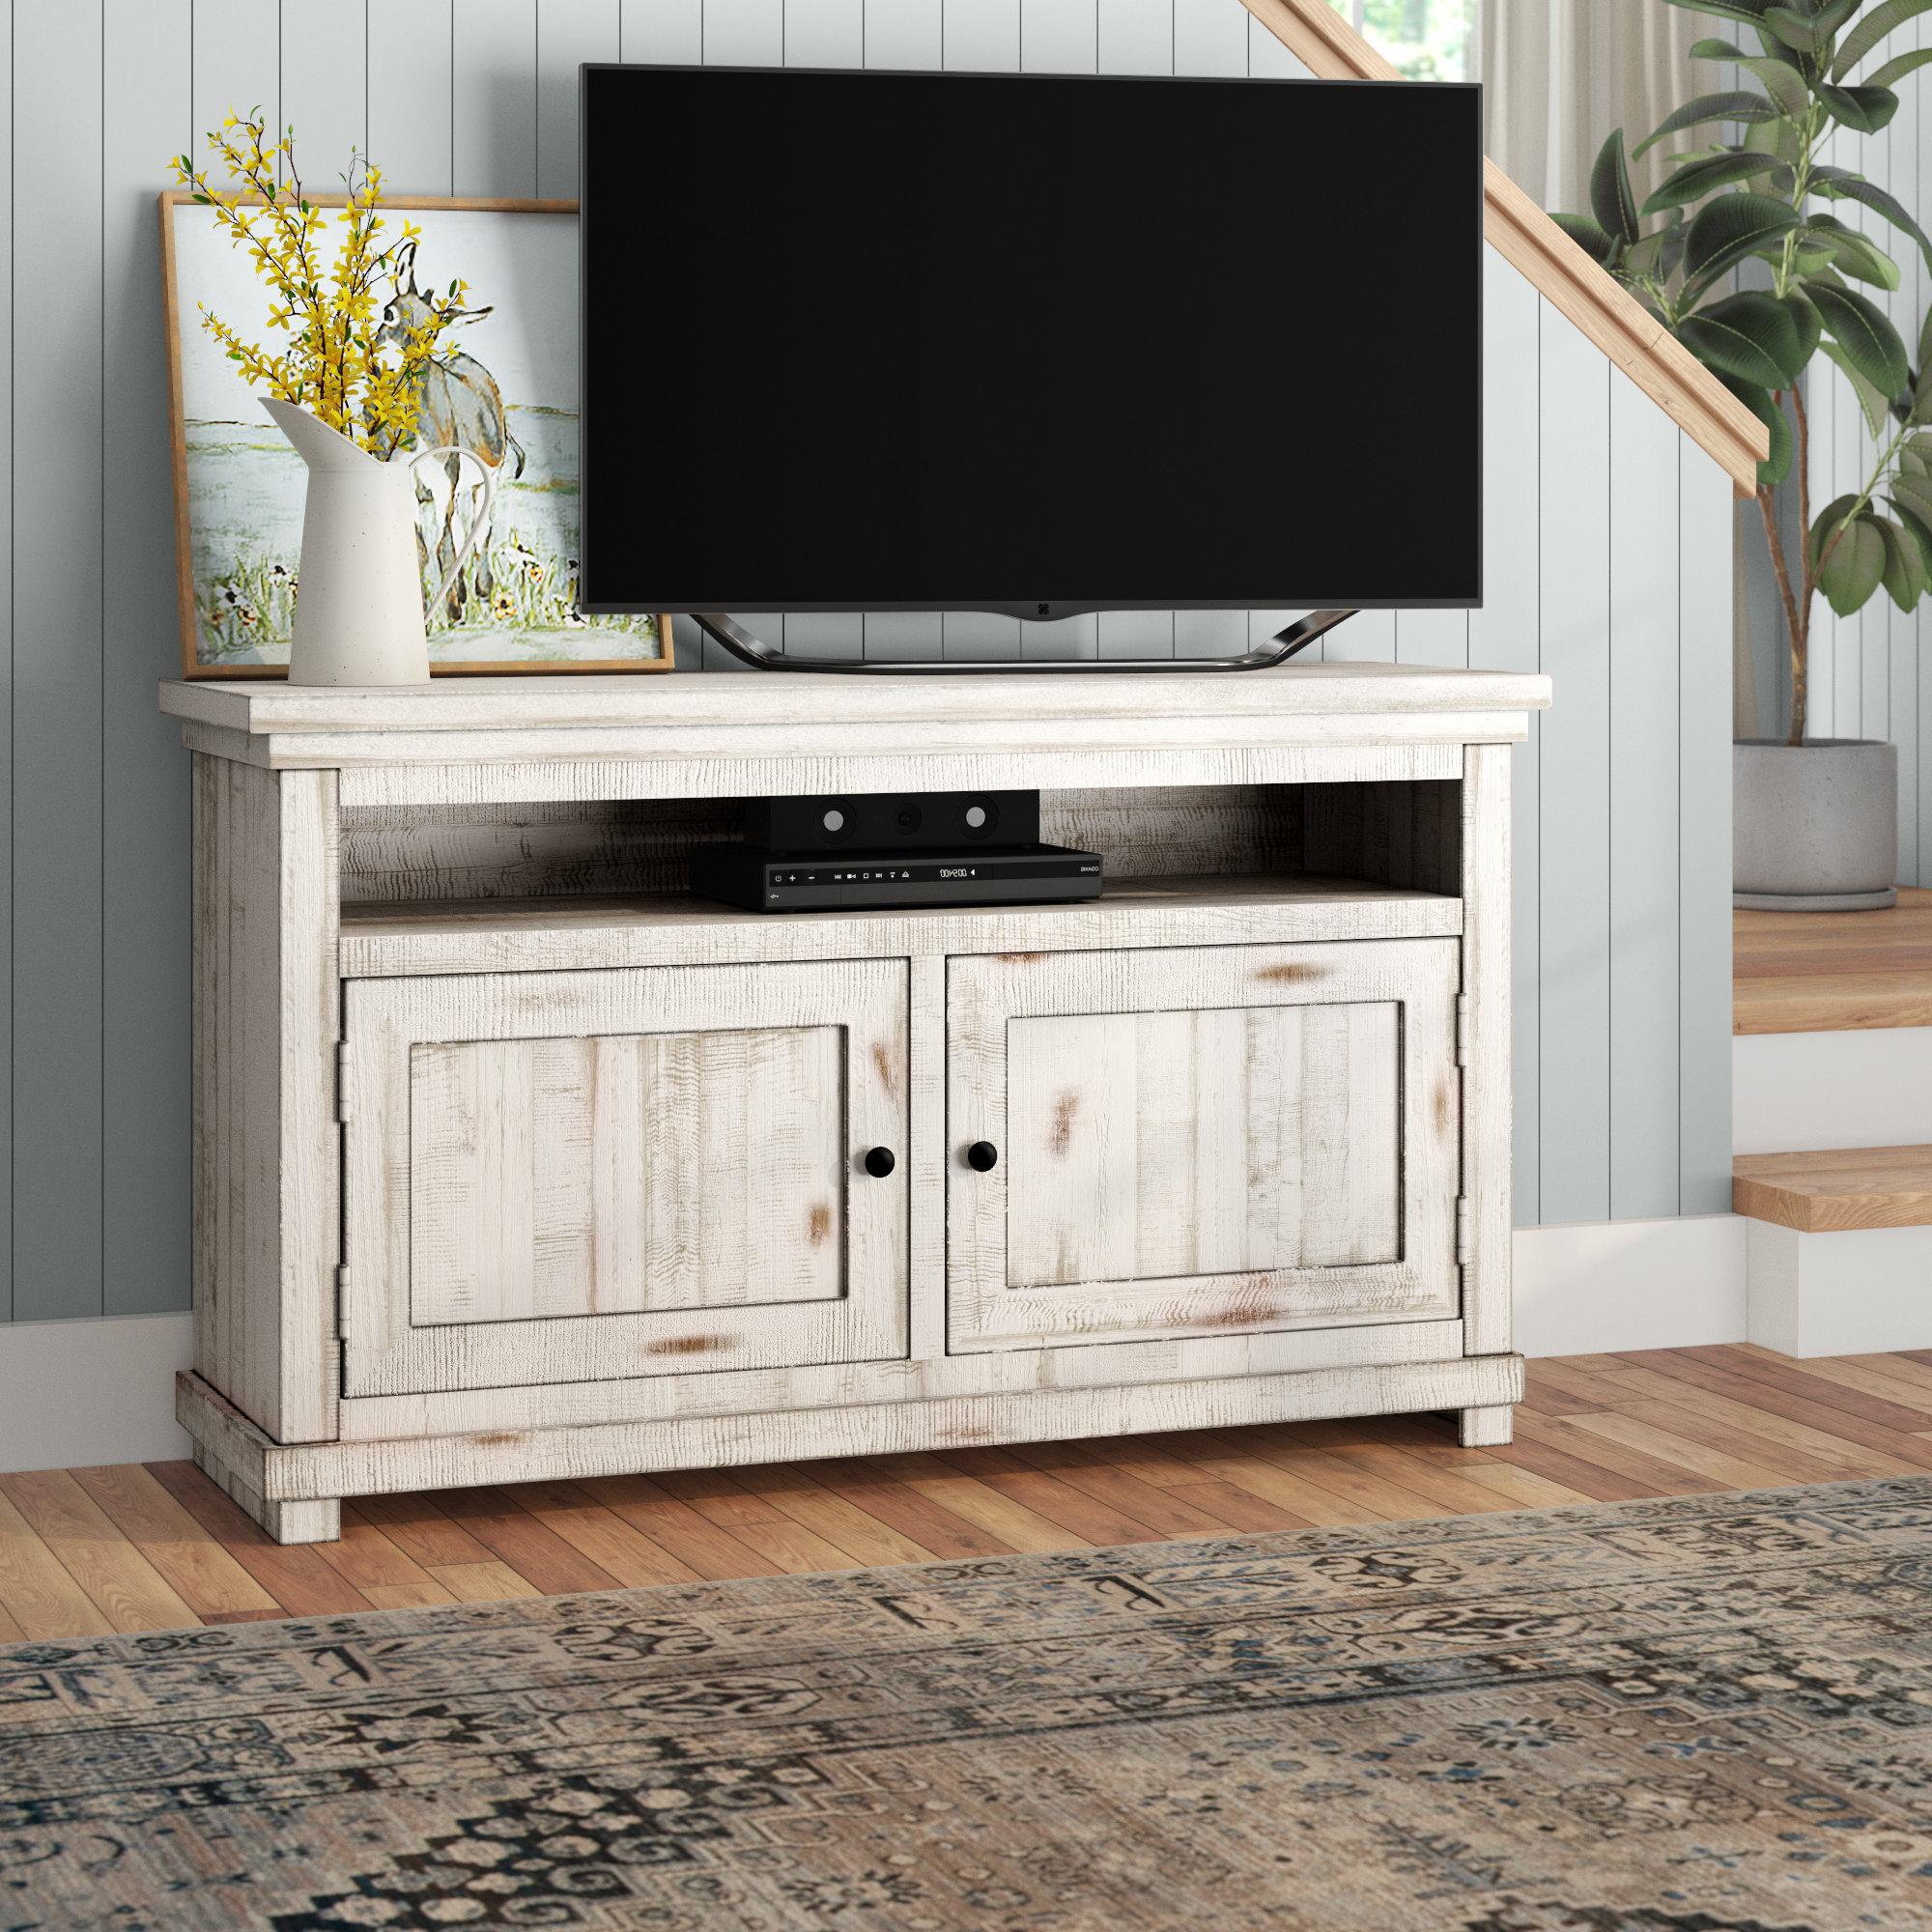 Wayfair Within Kenzie 72 Inch Open Display Tv Stands (View 19 of 20)